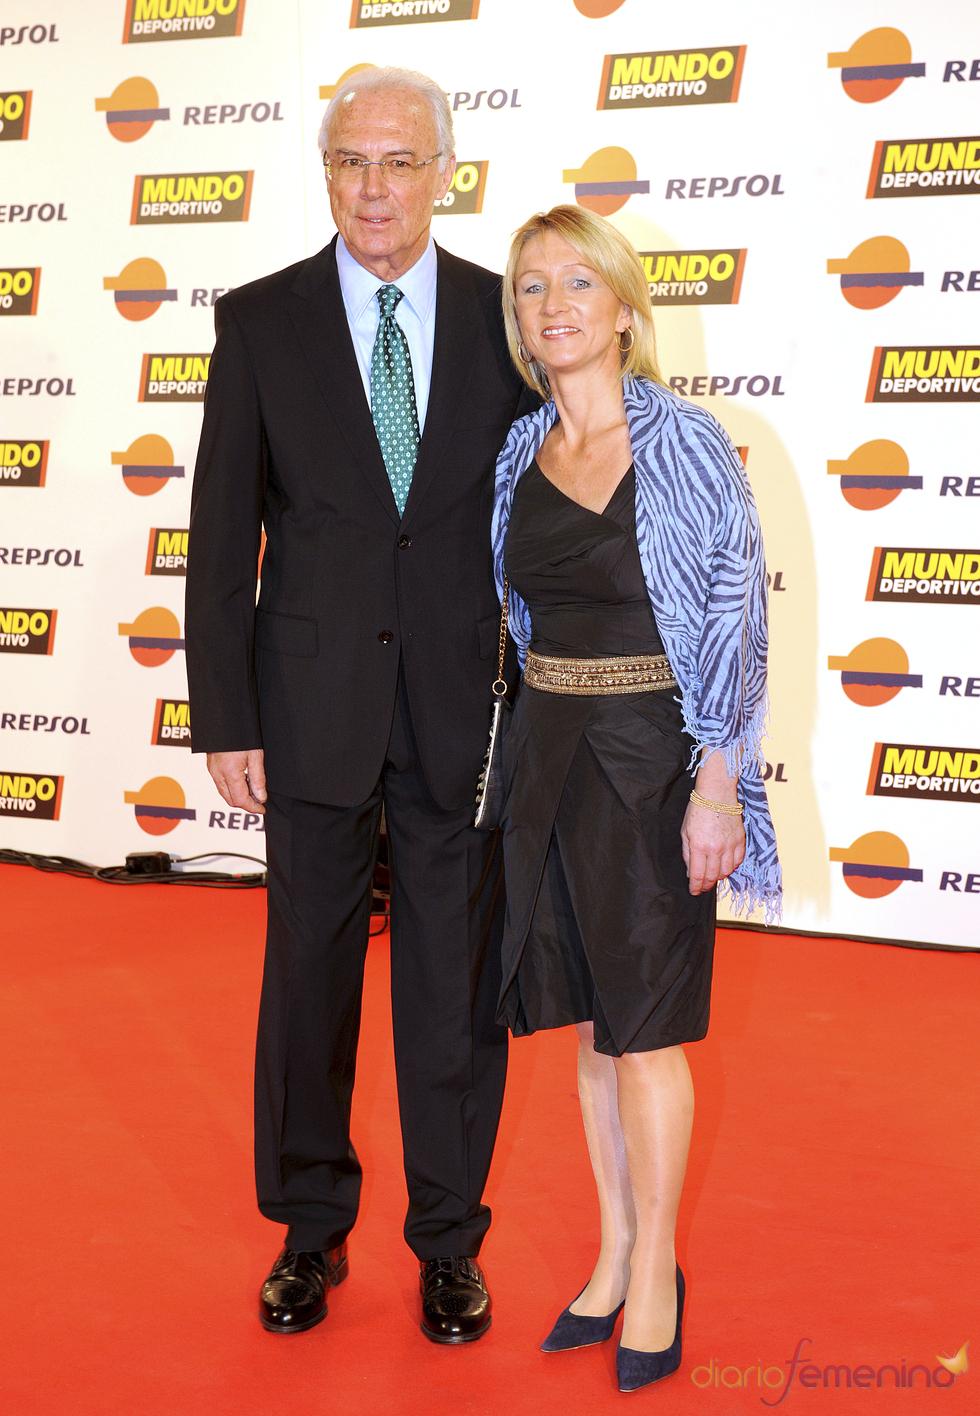 Franz Beckenbauer en la gala 'Mundo Deportivo' 2011